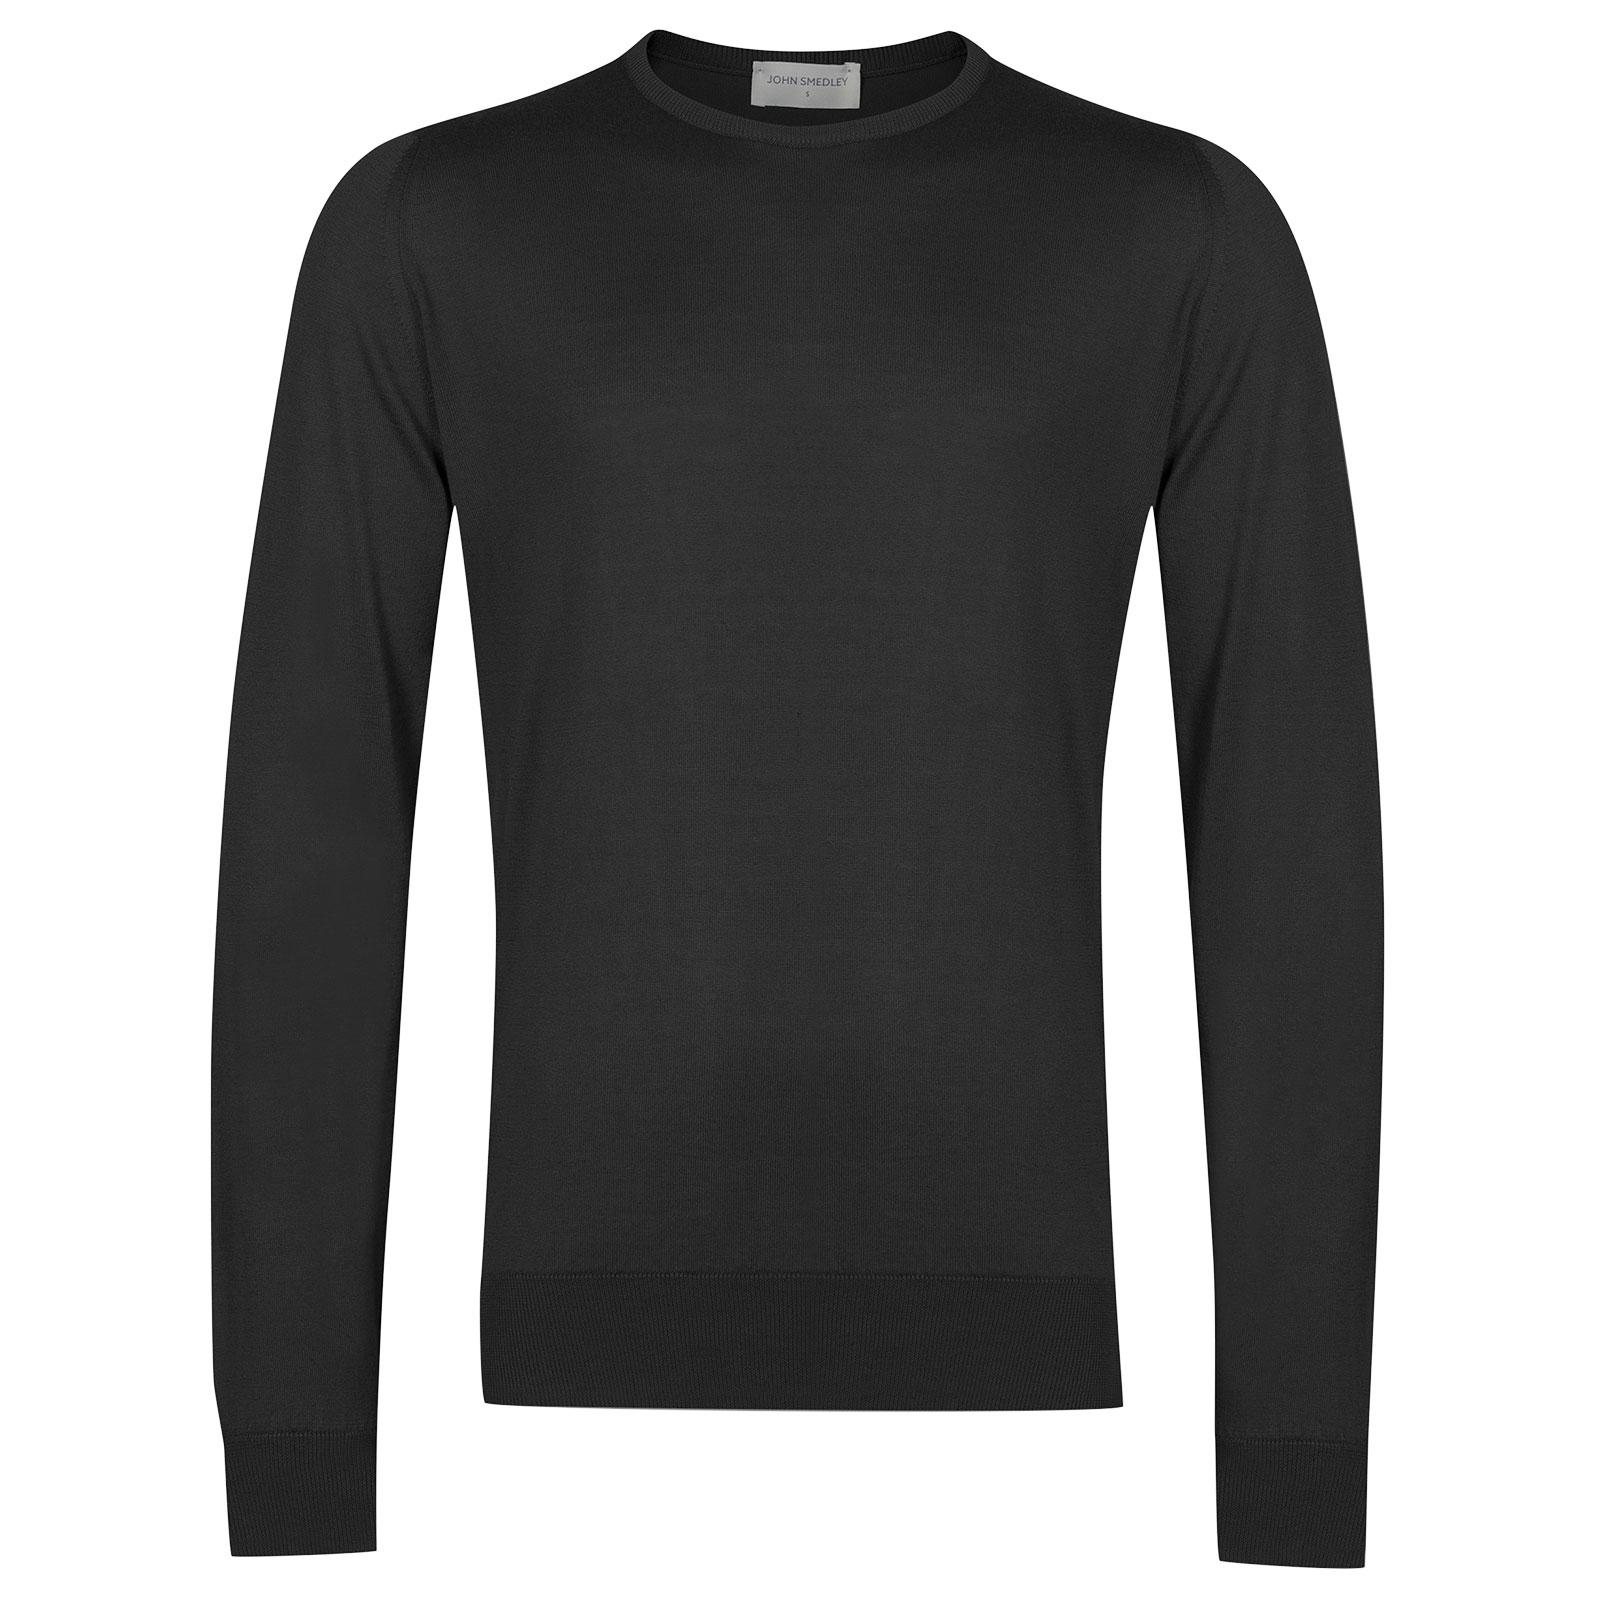 John Smedley HatfieldSea Island Cotton Pullover in Flannel Grey-XXL